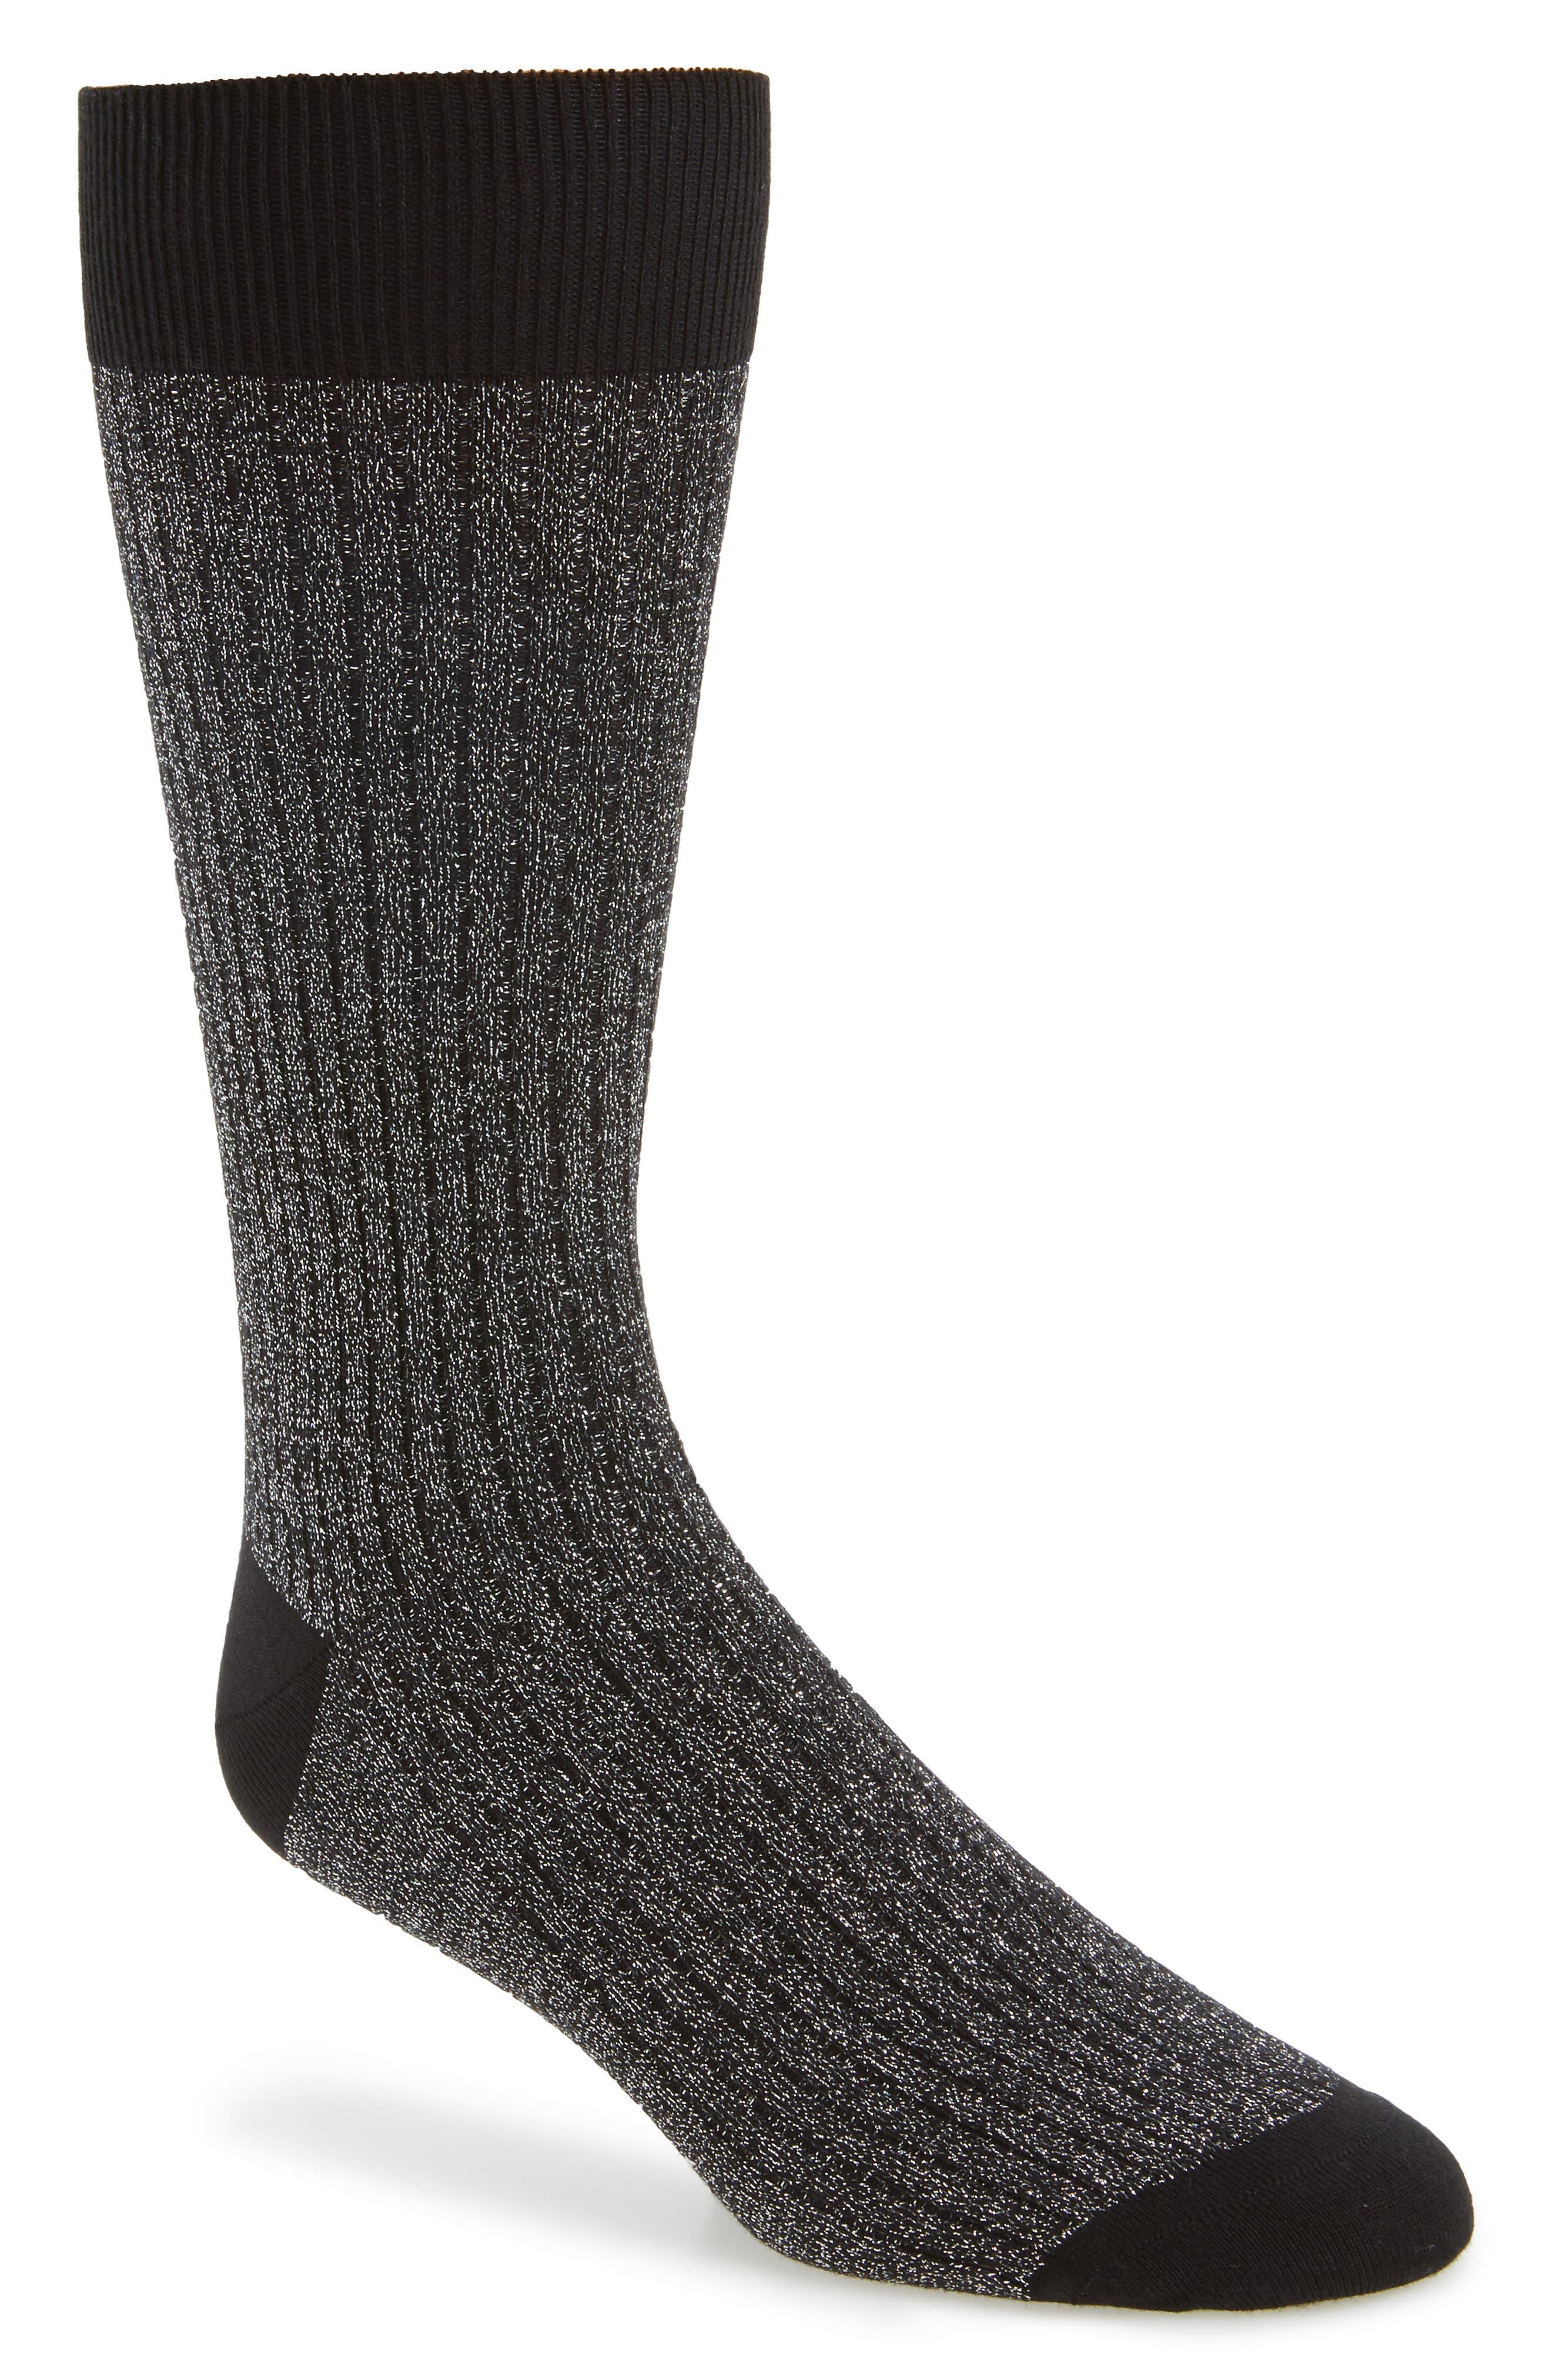 Sparkle Socks,                             Main thumbnail 1, color,                             001